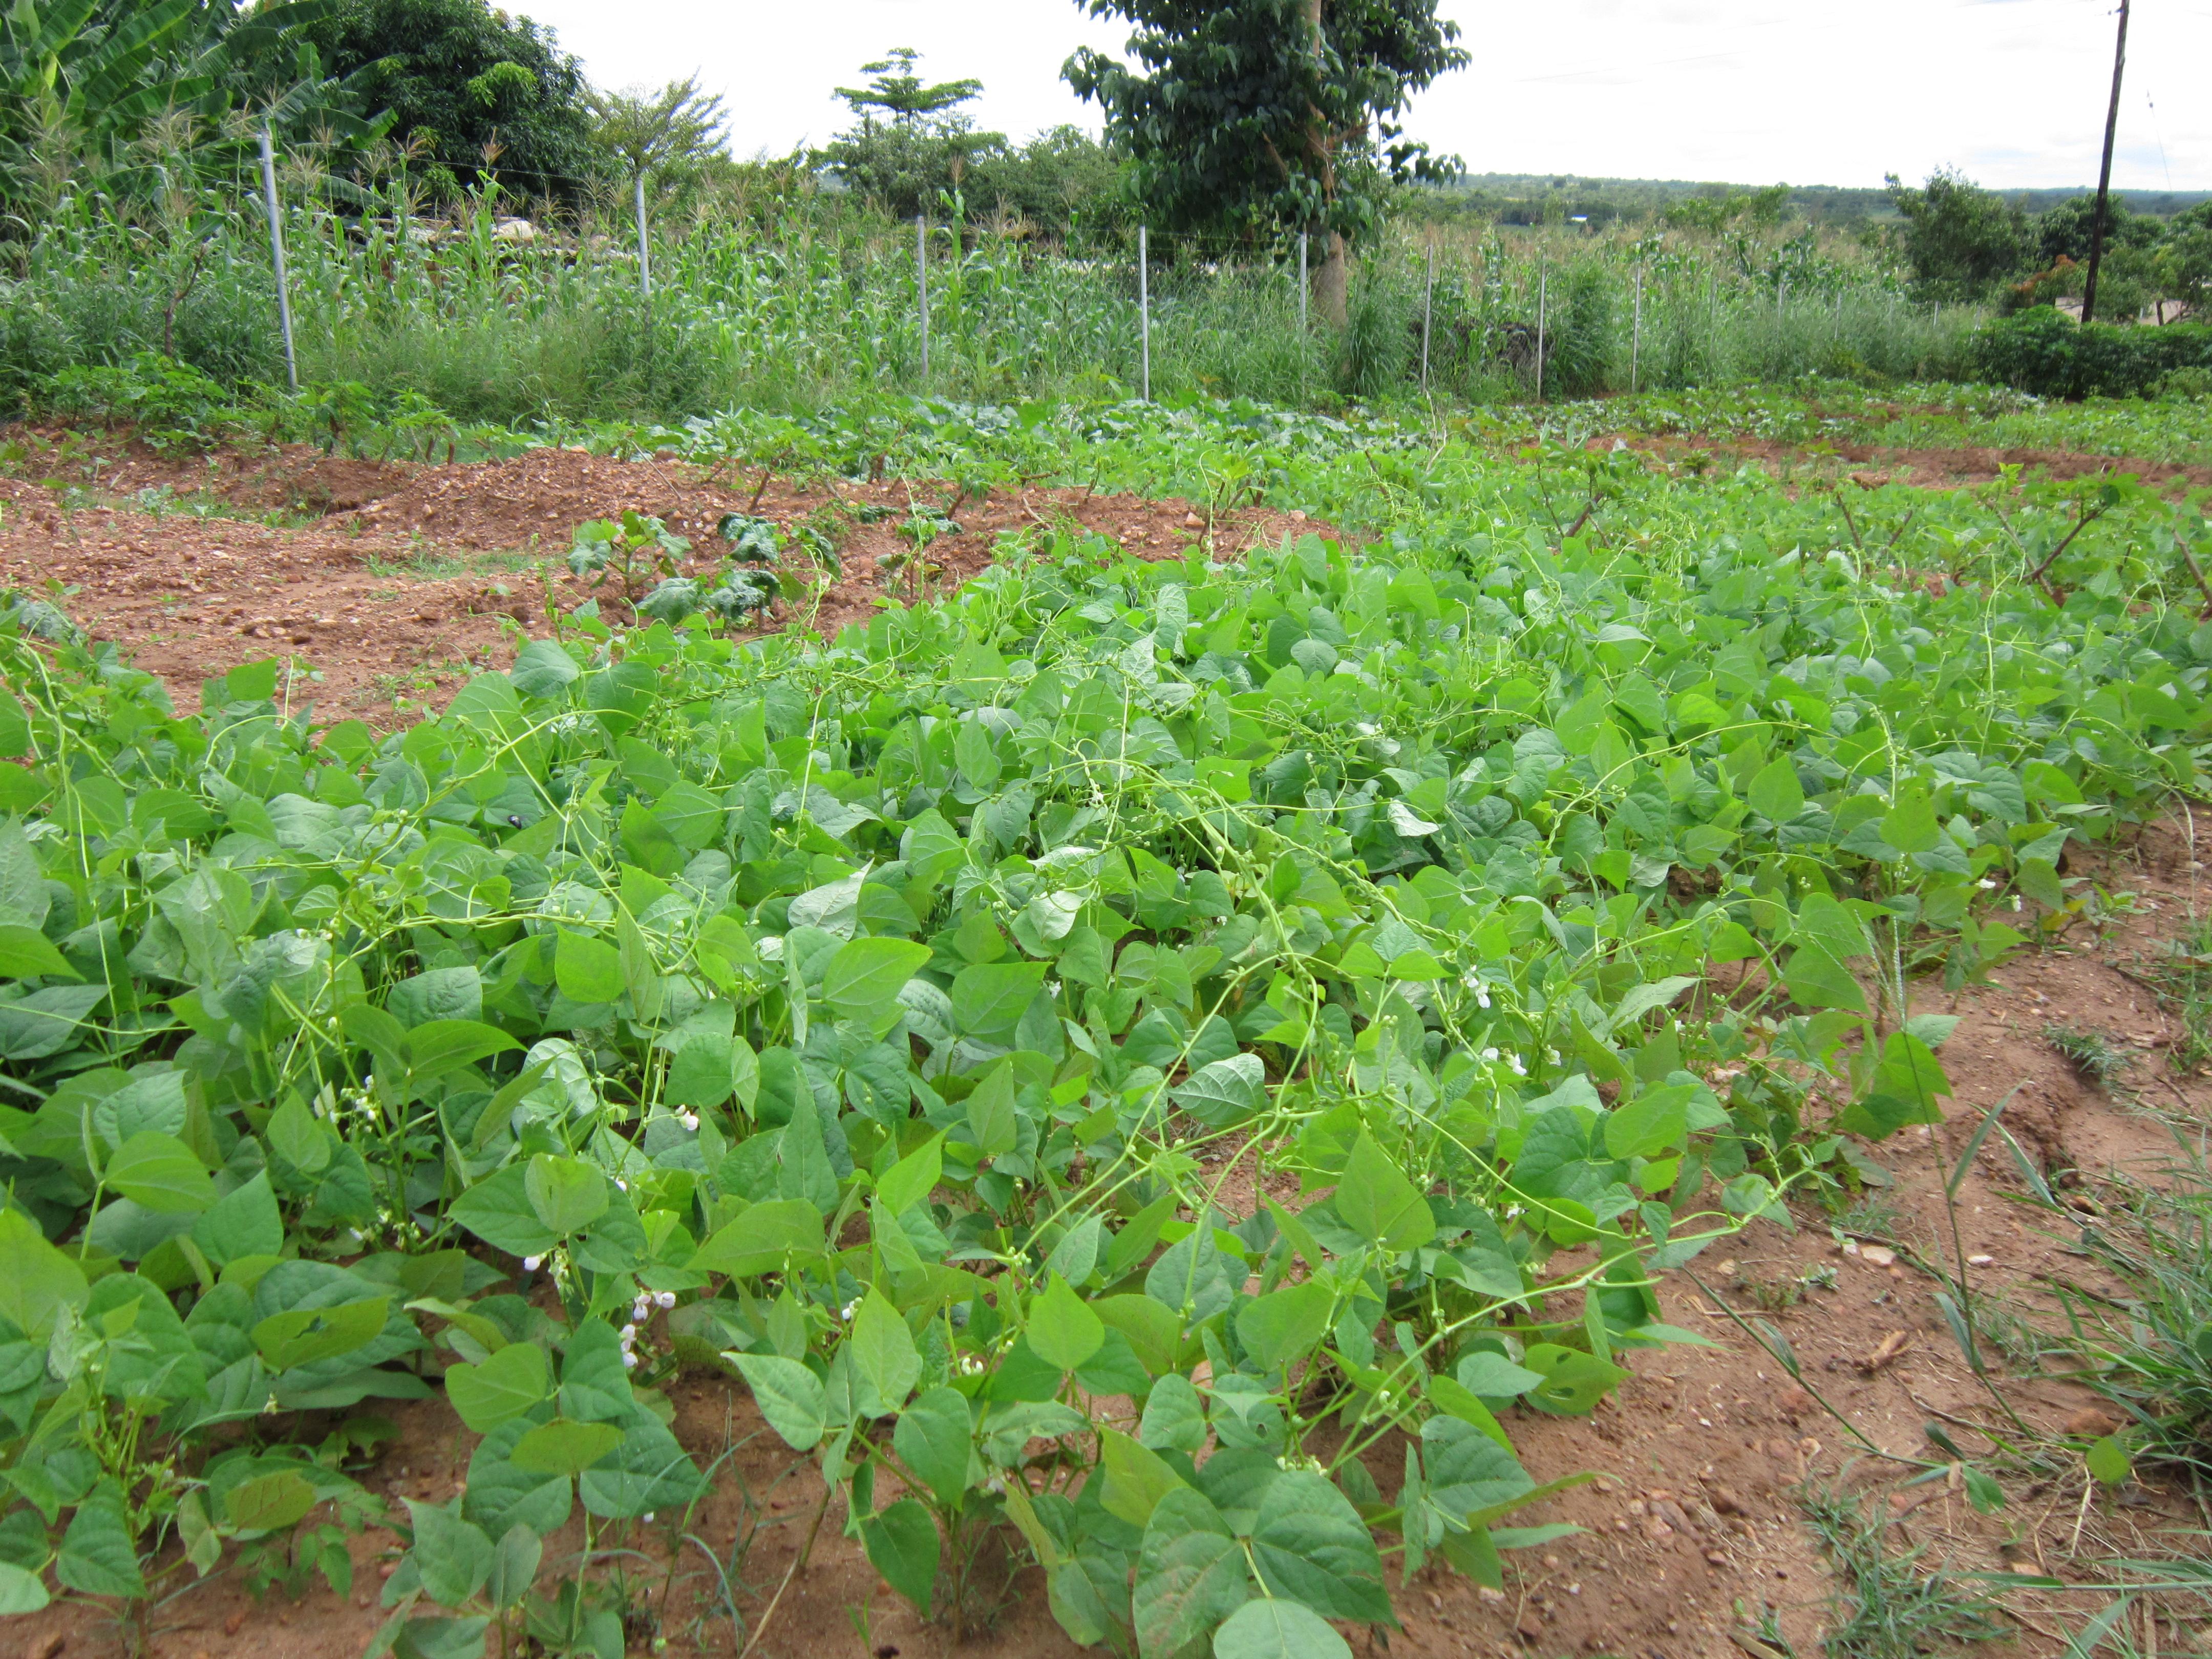 chongwe - Farming God's way